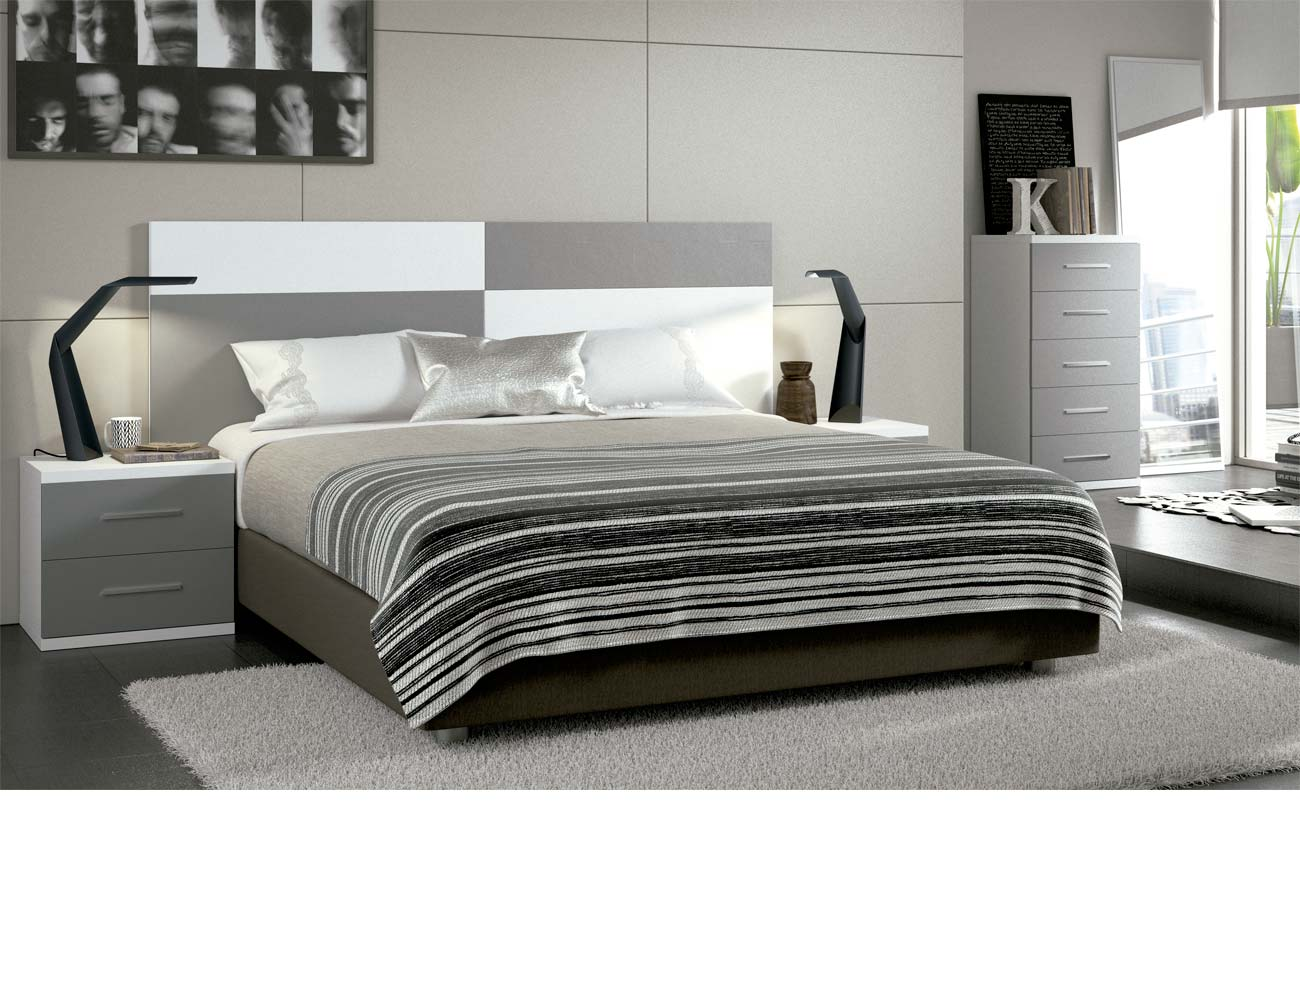 Dormitorio matrimonio moderno 25 blanco gris